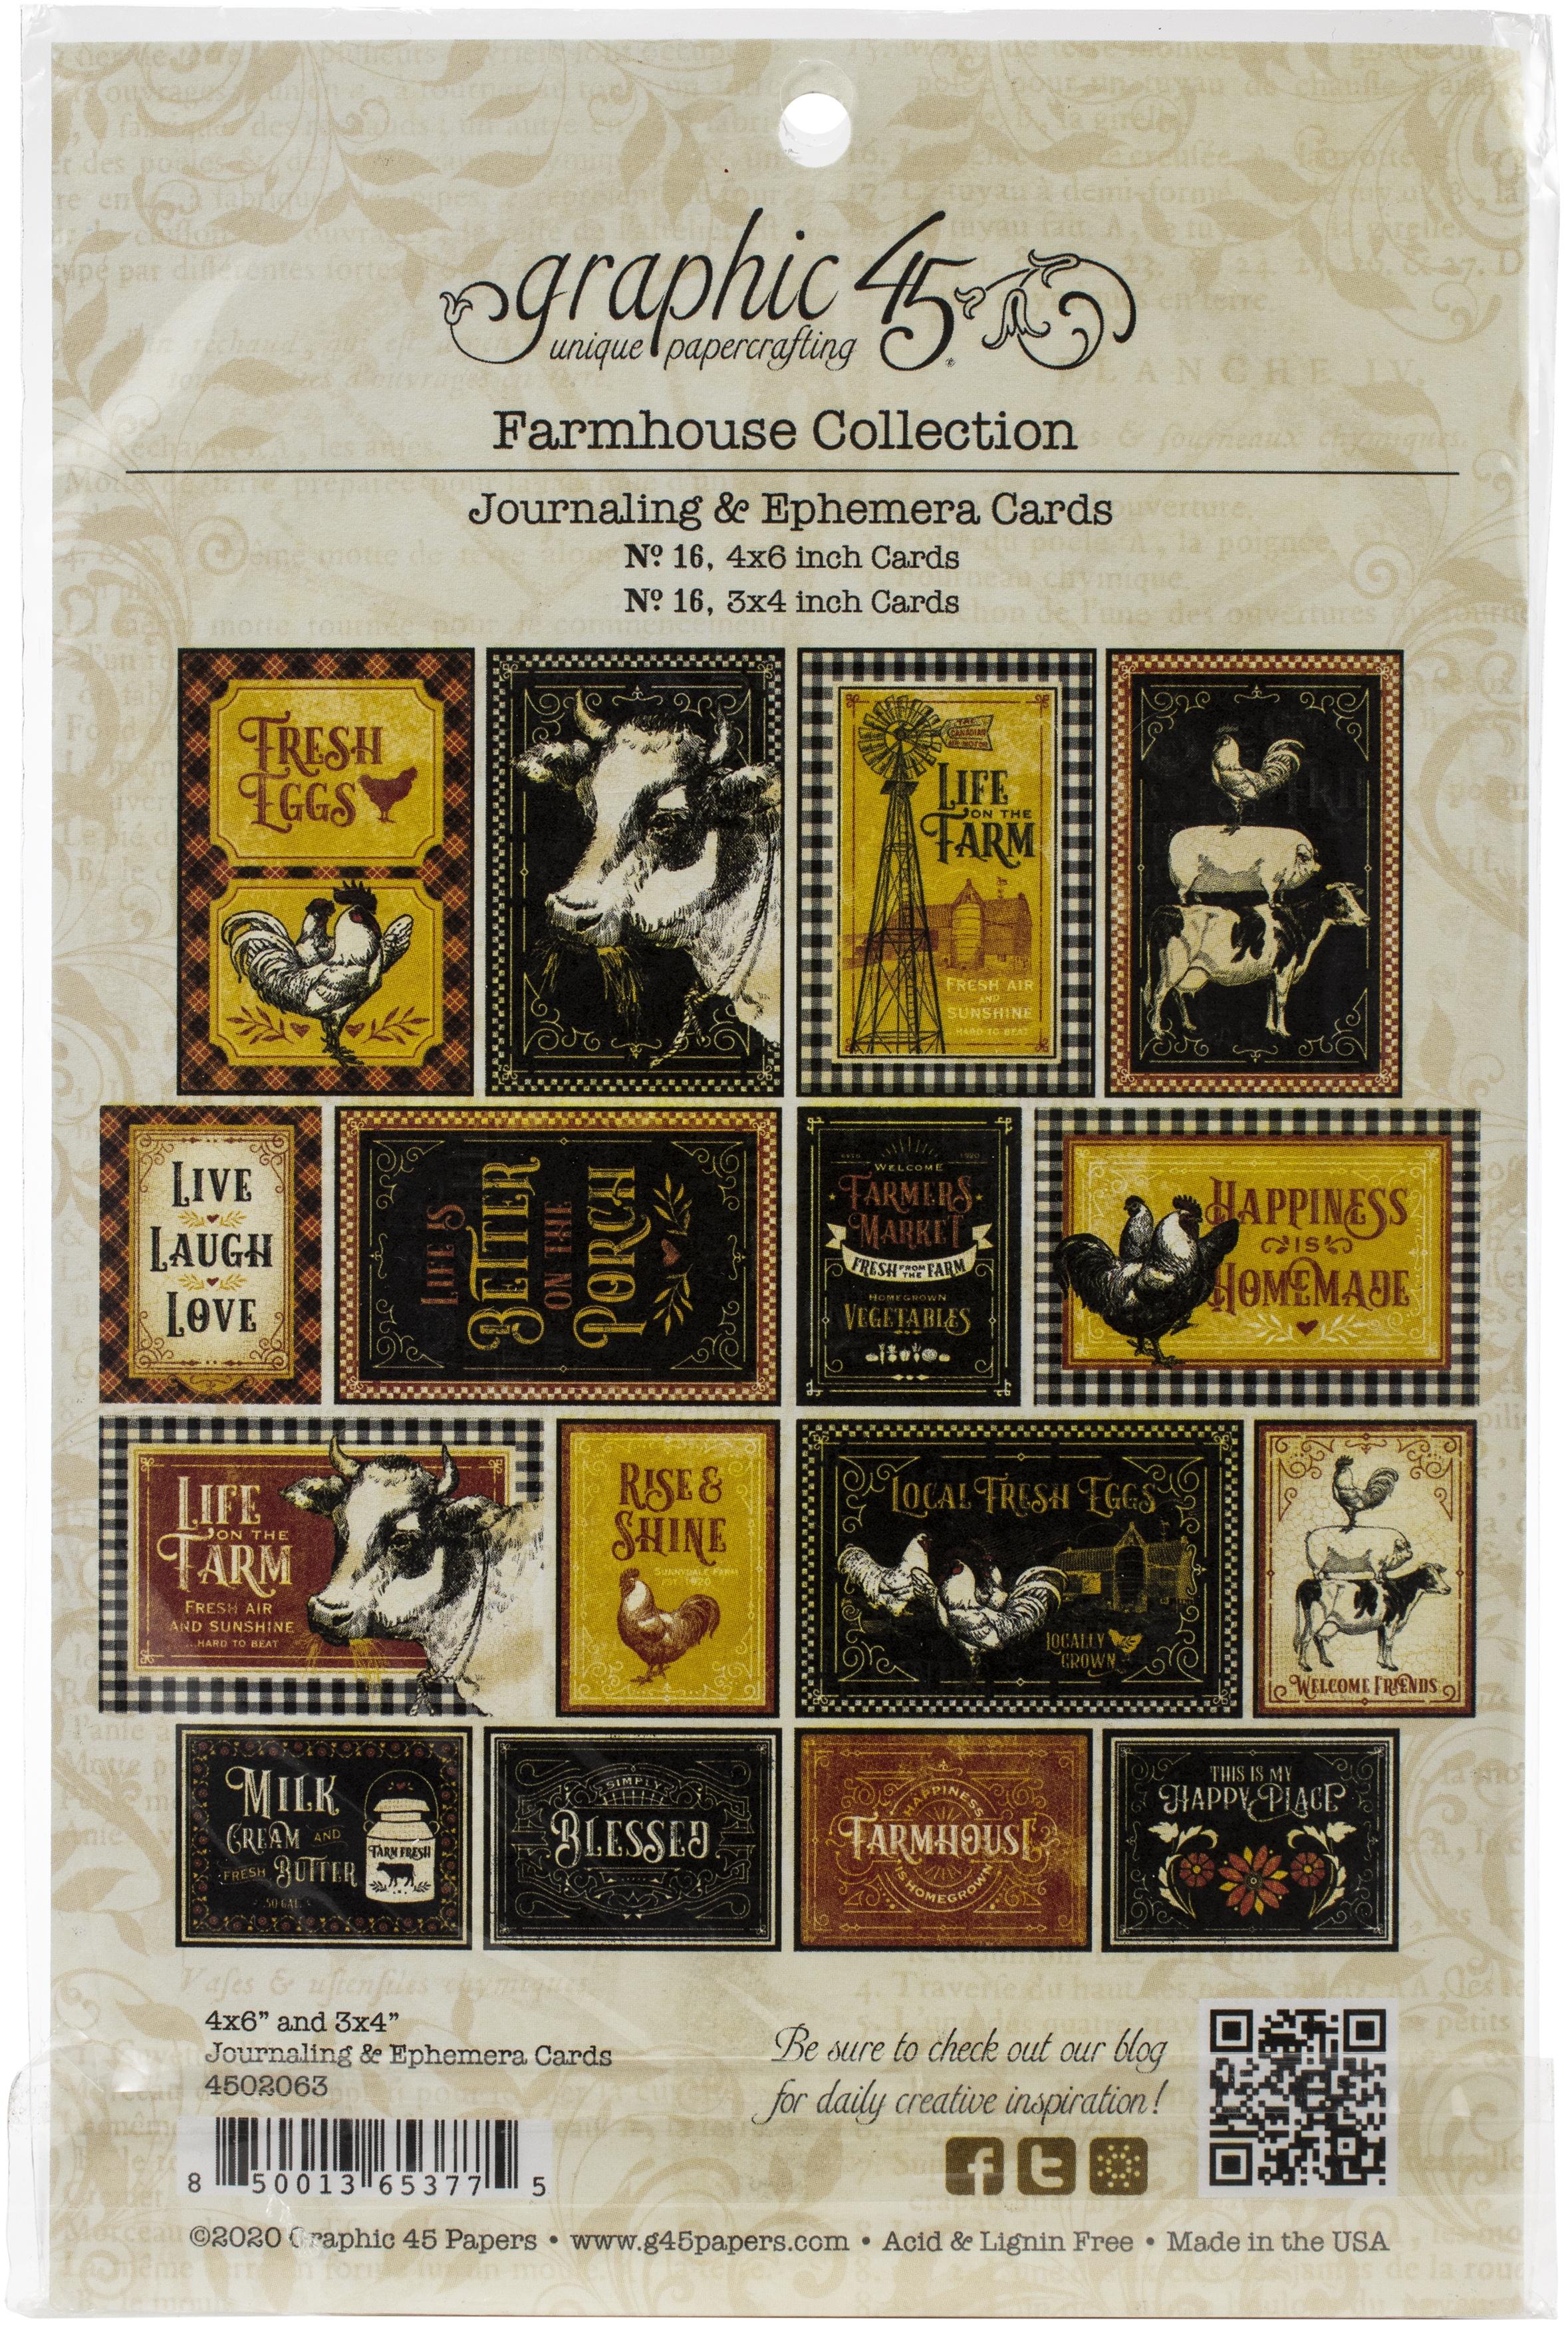 Farmhouse Ephemera Cards-(16) 4X6 & (16) 3X4